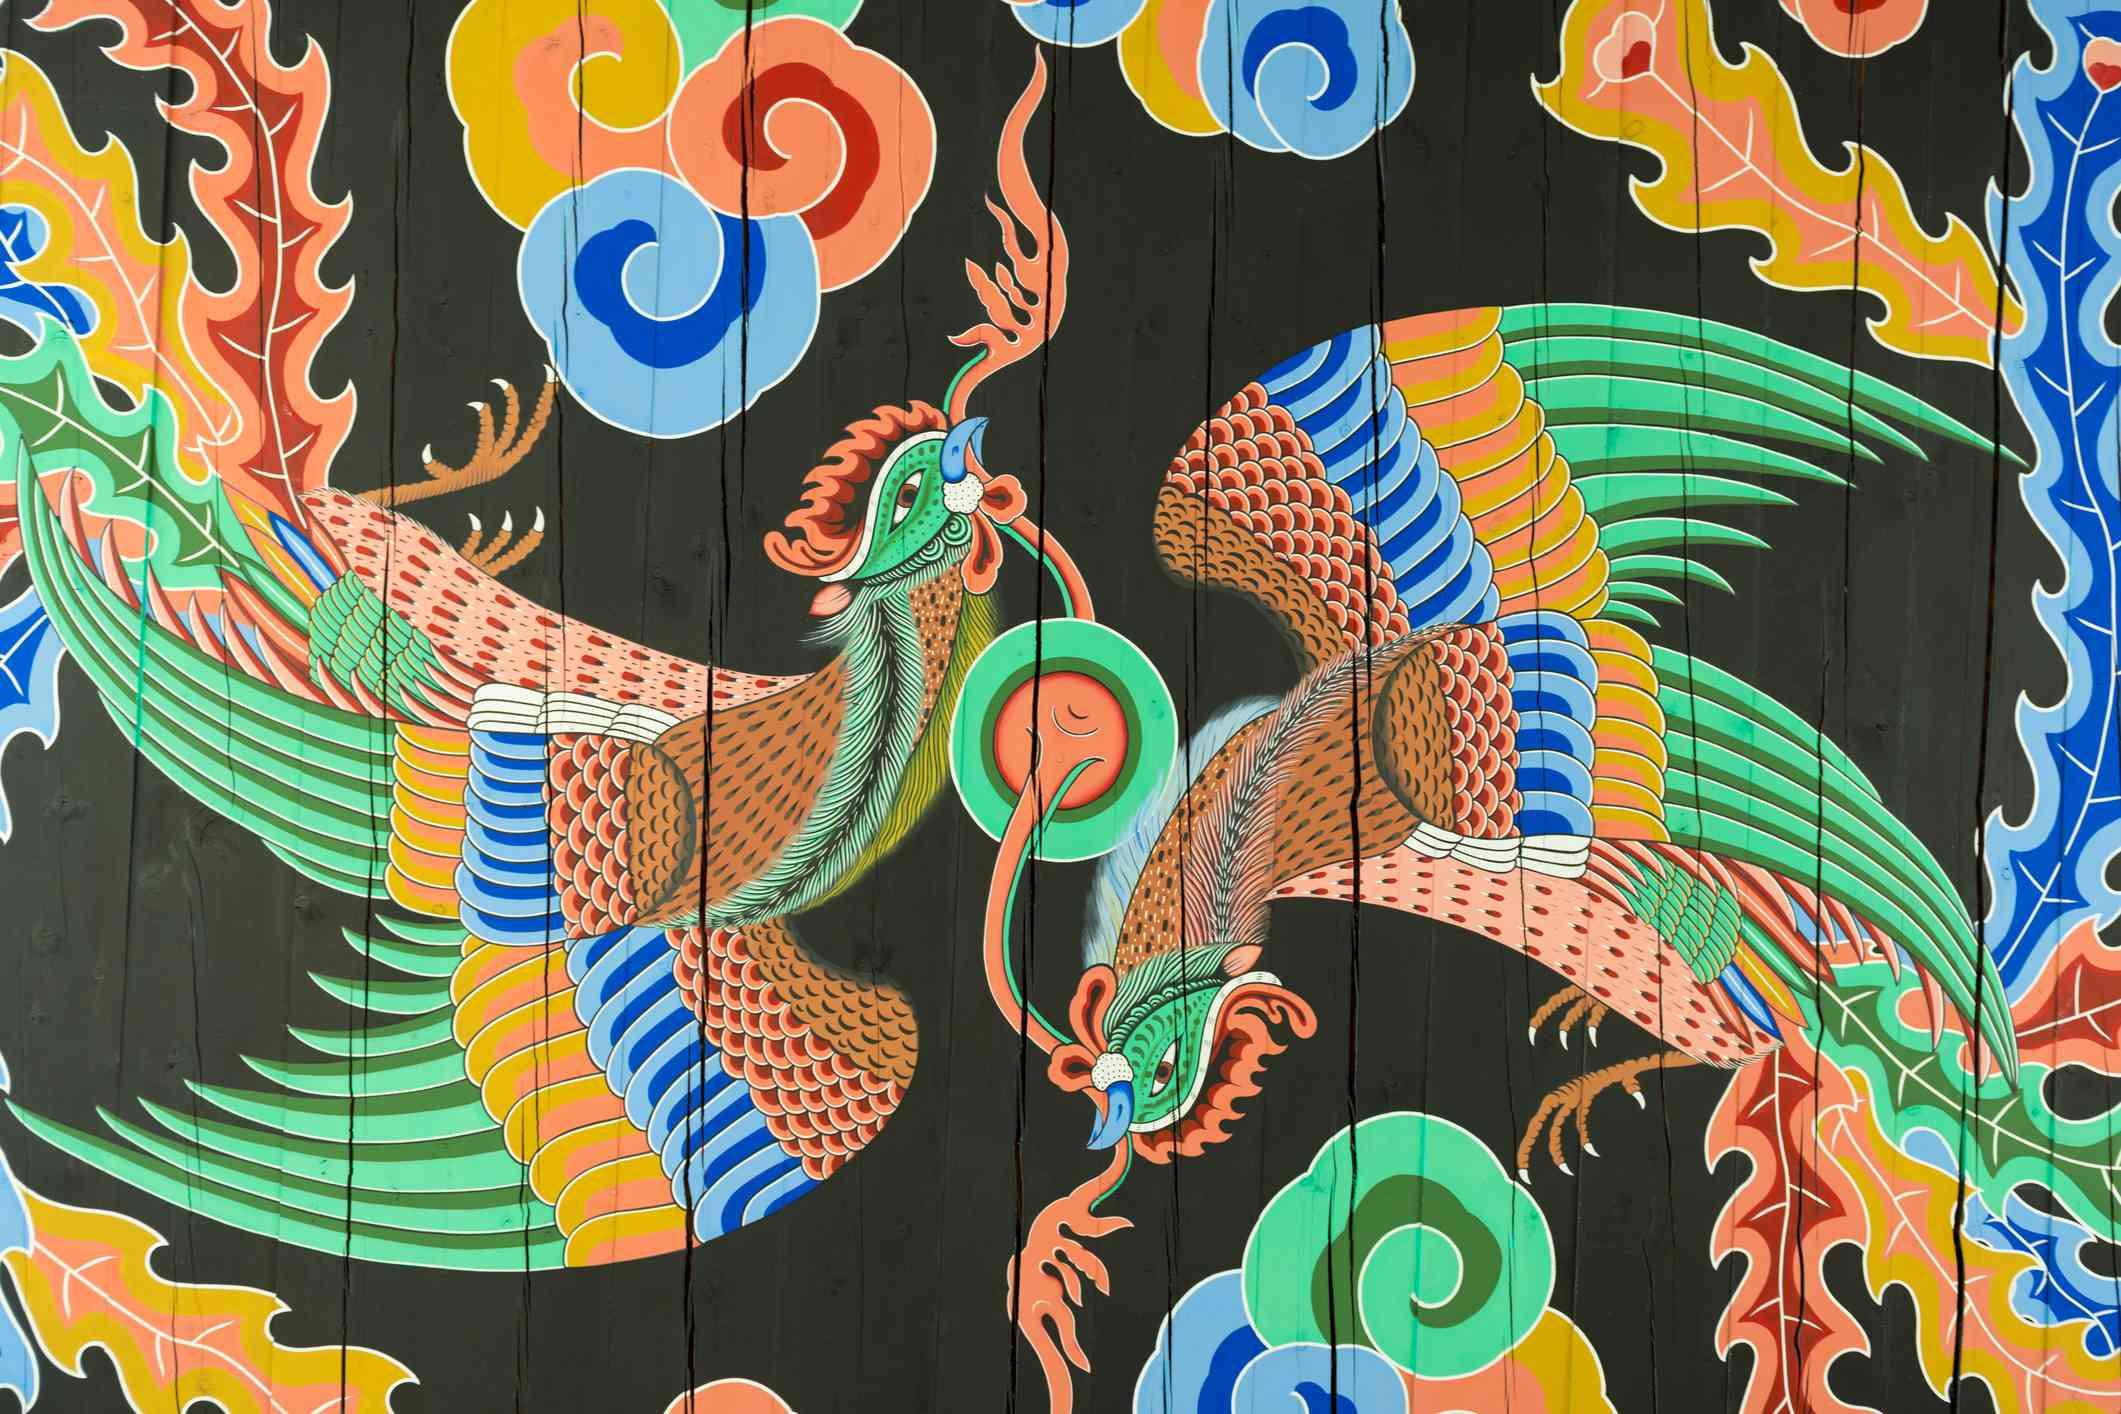 Ceiling detail of twin phoenix birds in Gwanghwamun, main gate of Gyengbokgung palace in Seoul.